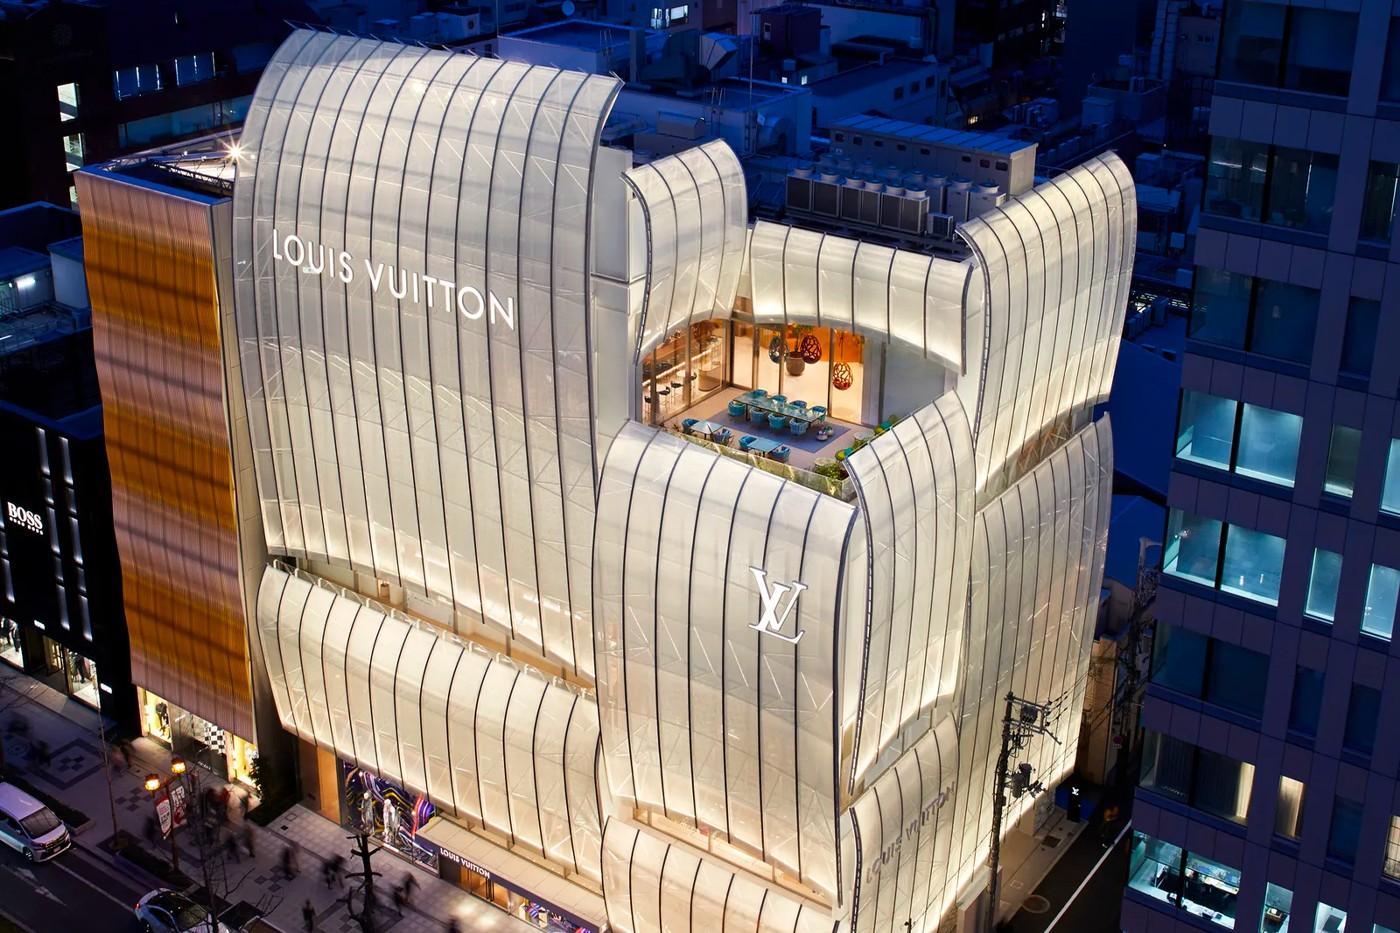 Louis Vuitton restaurant 6